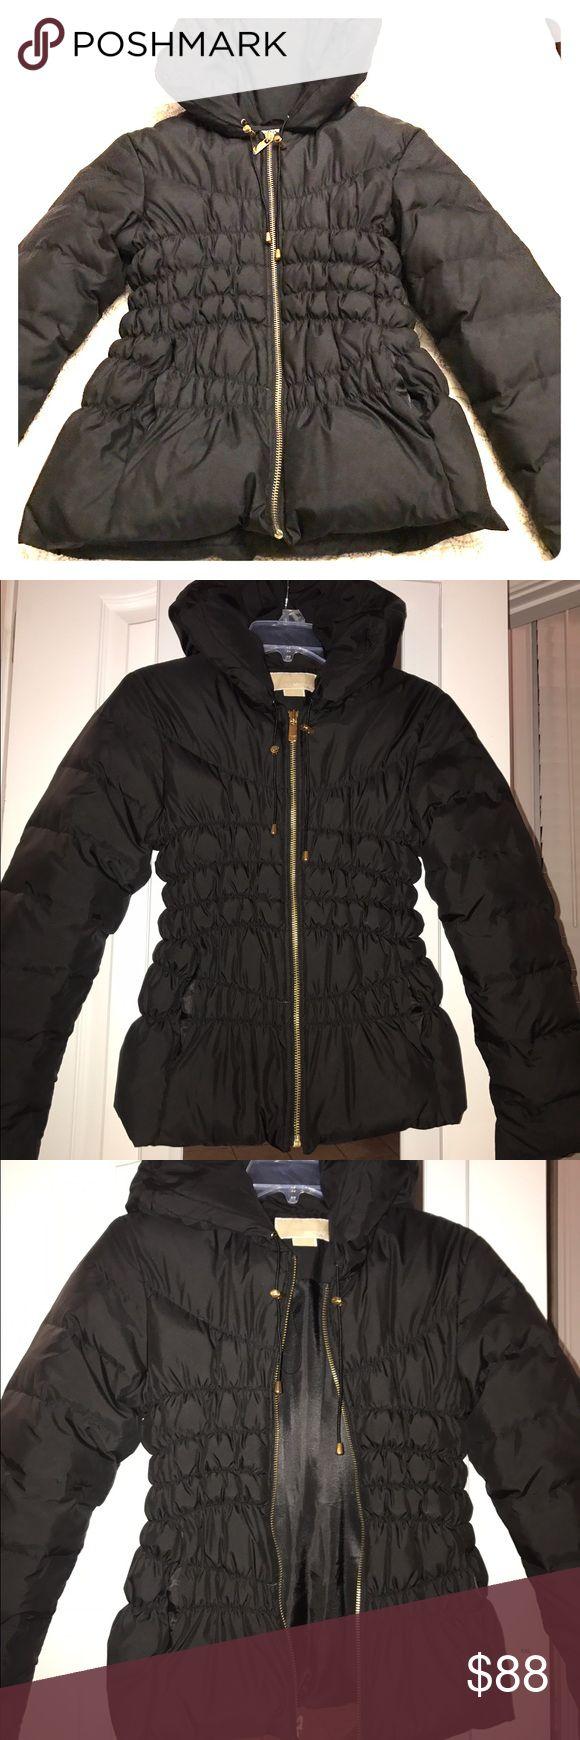 MK puffed jacket Michael Kors Hooded Packable Down Puffer Coat !! Like new condition!!😍😘 MICHAEL Michael Kors Jackets & Coats Puffers